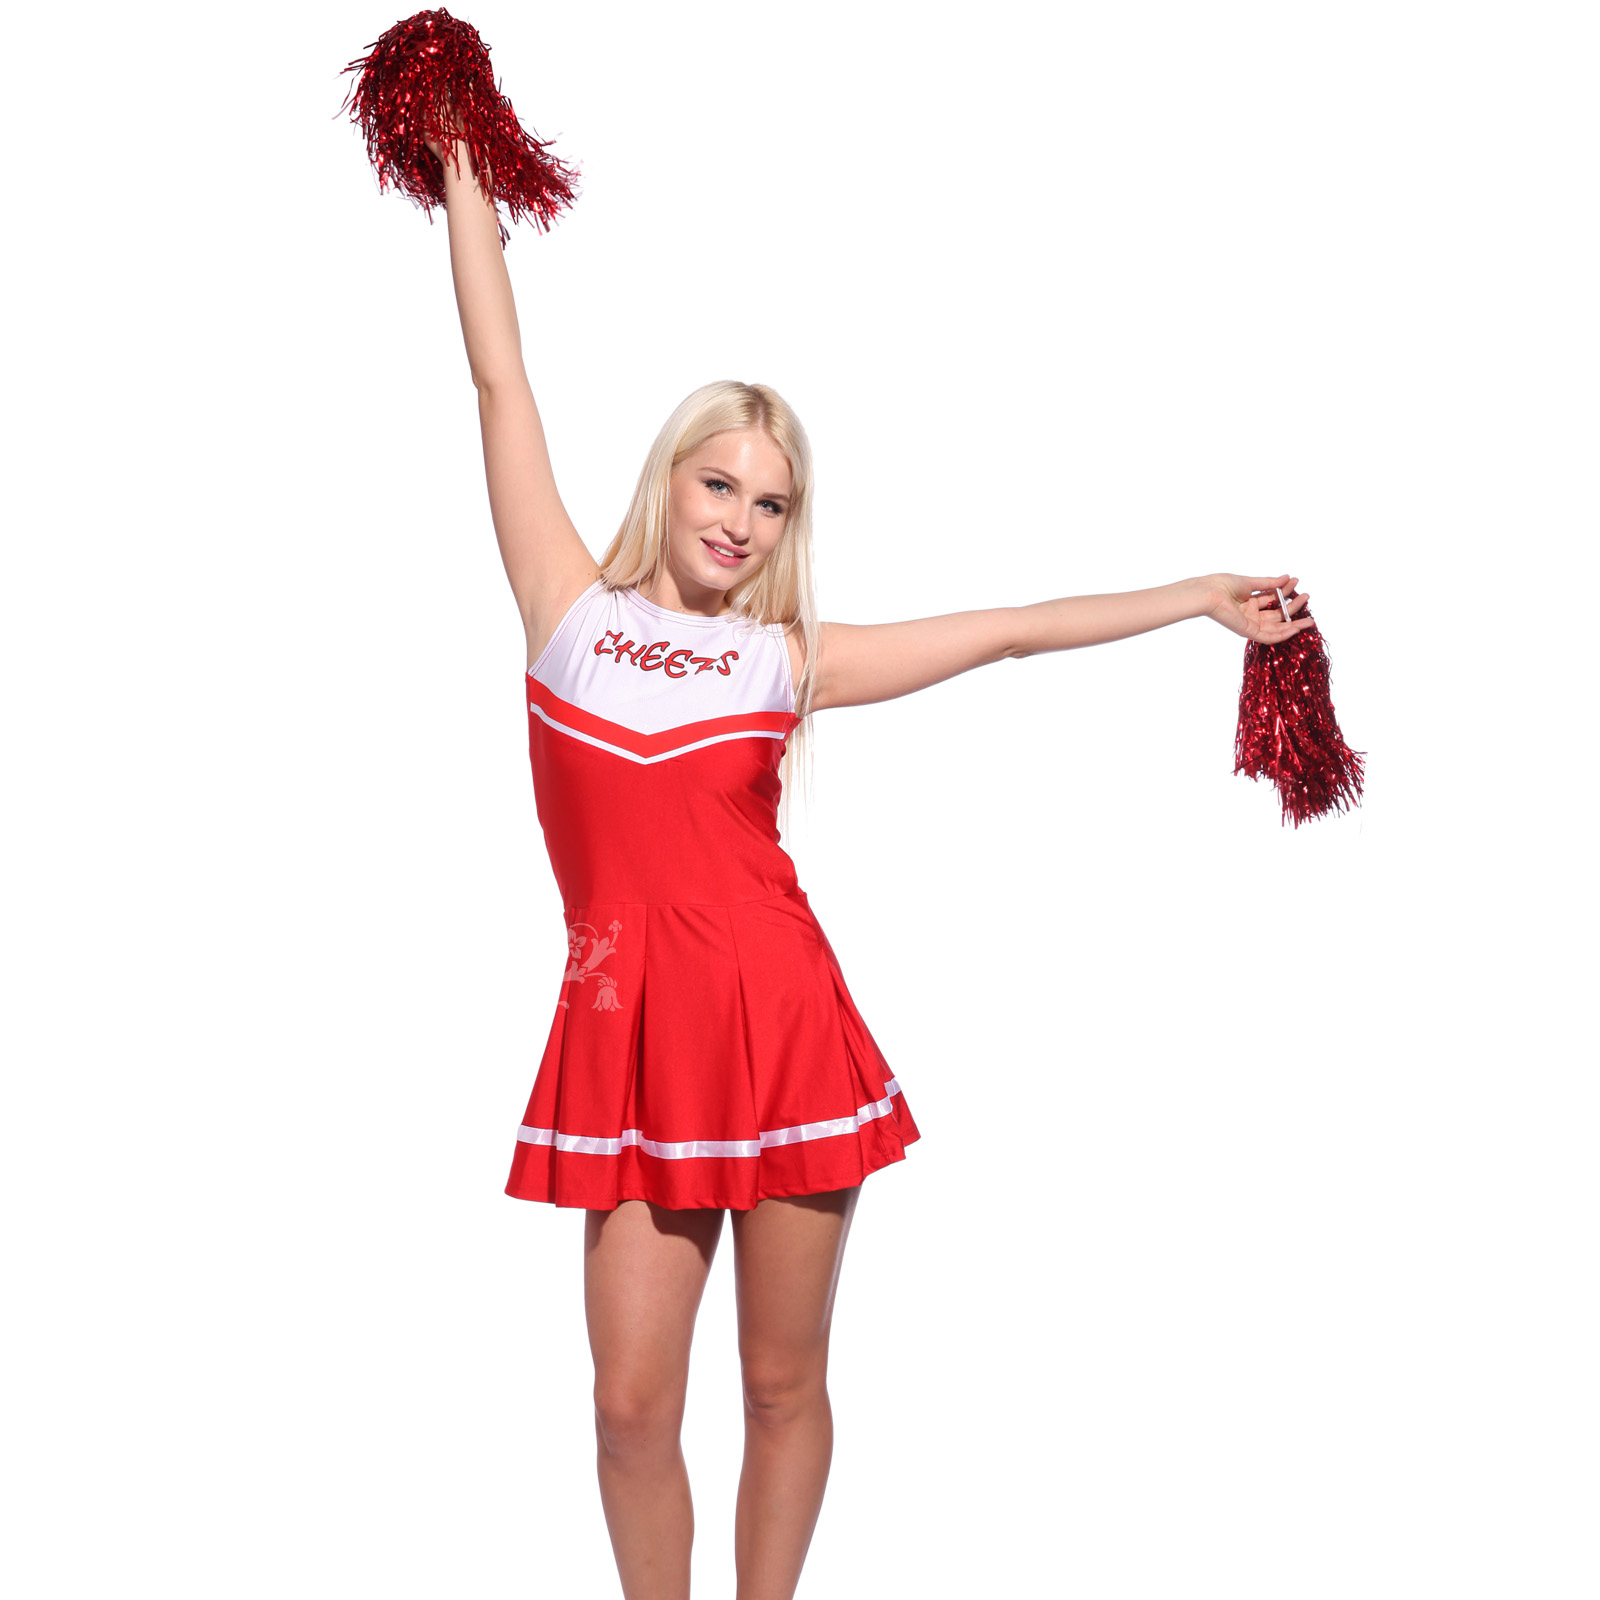 Glee High School Cheerleading Costume Cheerleader Clothes Outfit Dress AU 6 - 16 | eBay